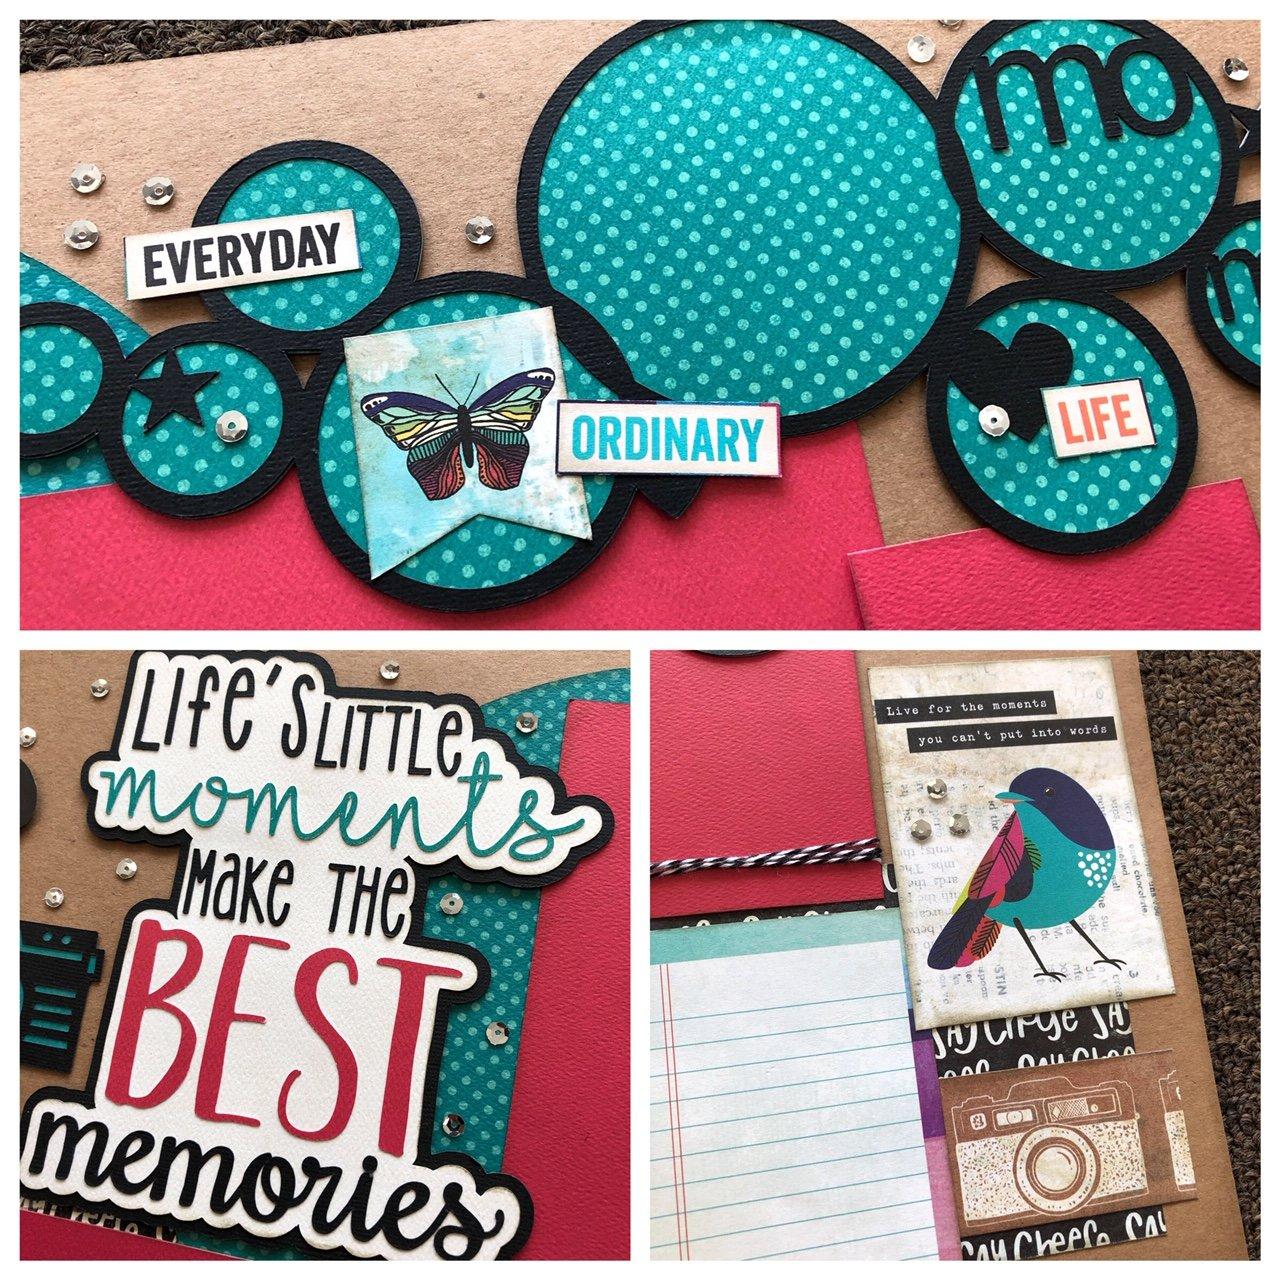 Life's Little Moments Make the Best Memories Kit